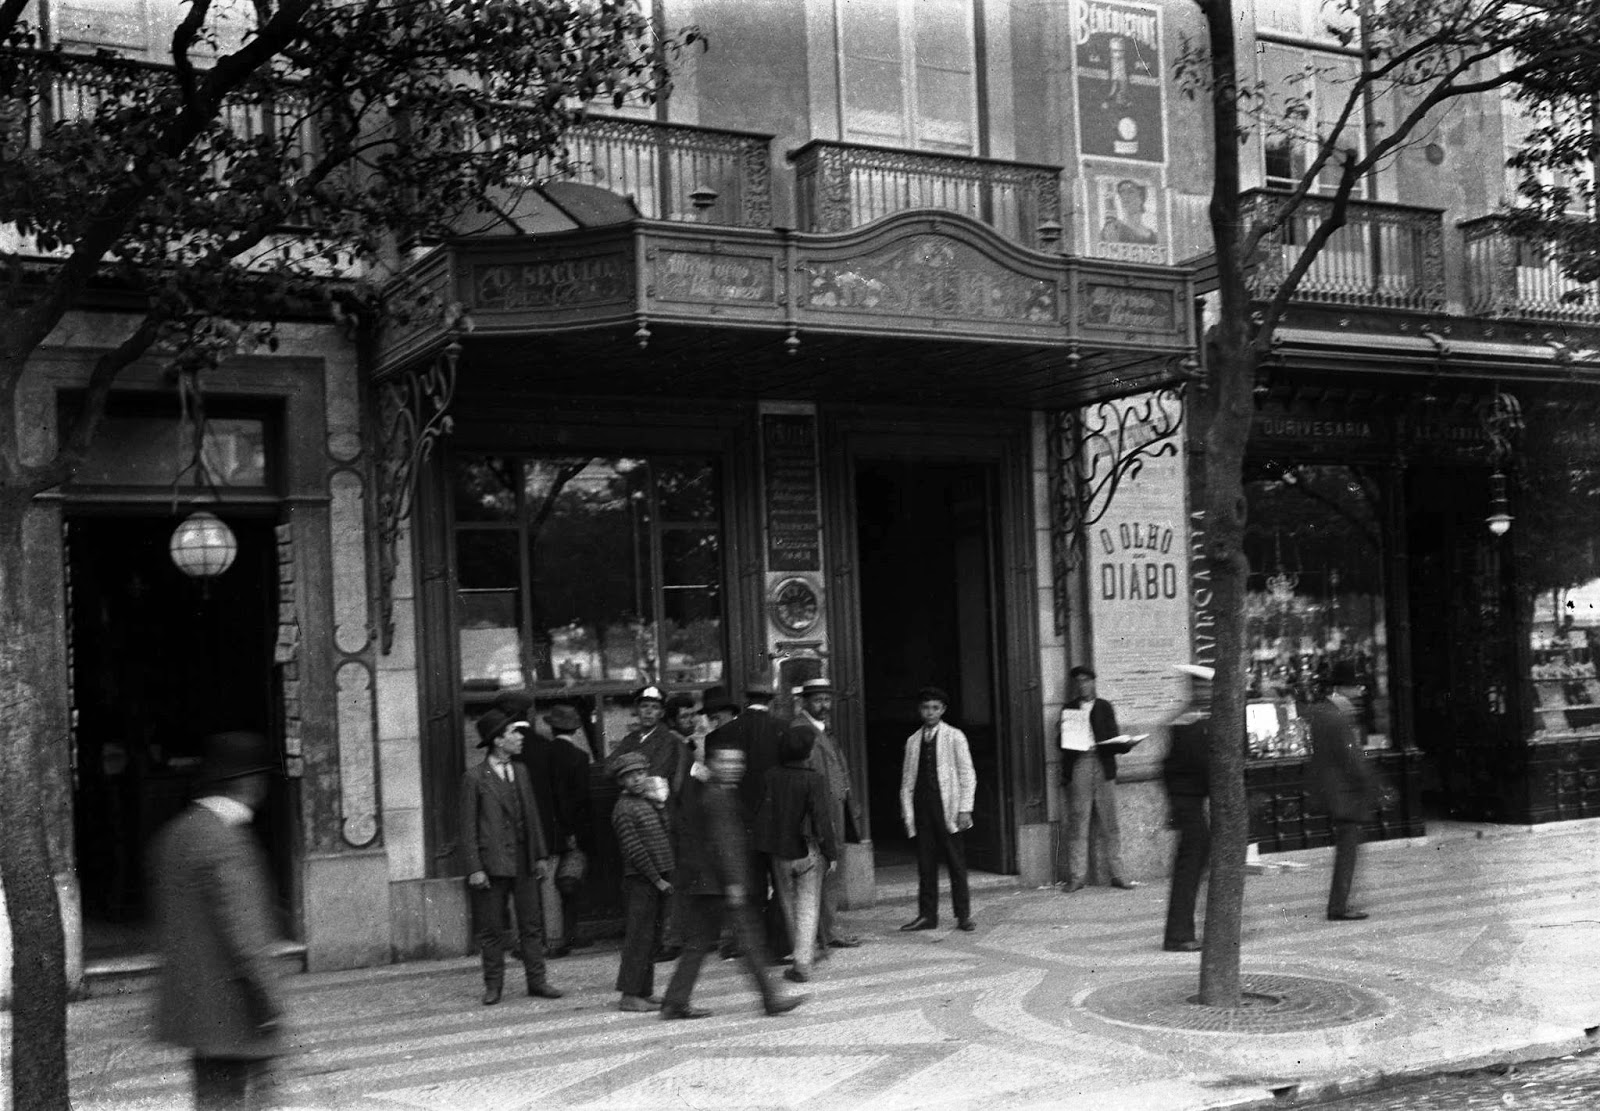 [Suvursal-do-Jornal-O-Sculo-19105]